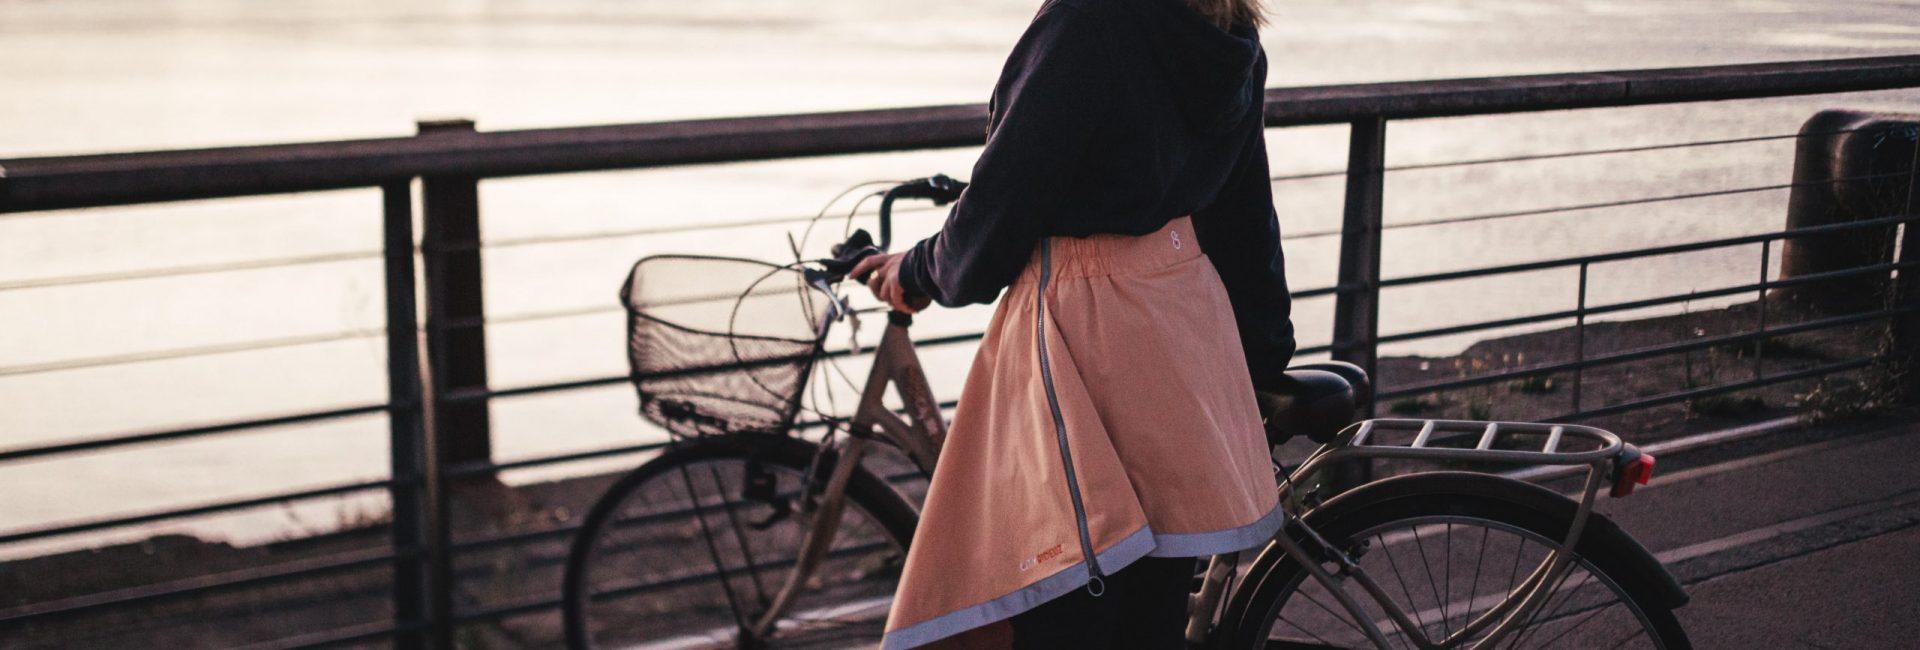 Clara abricot